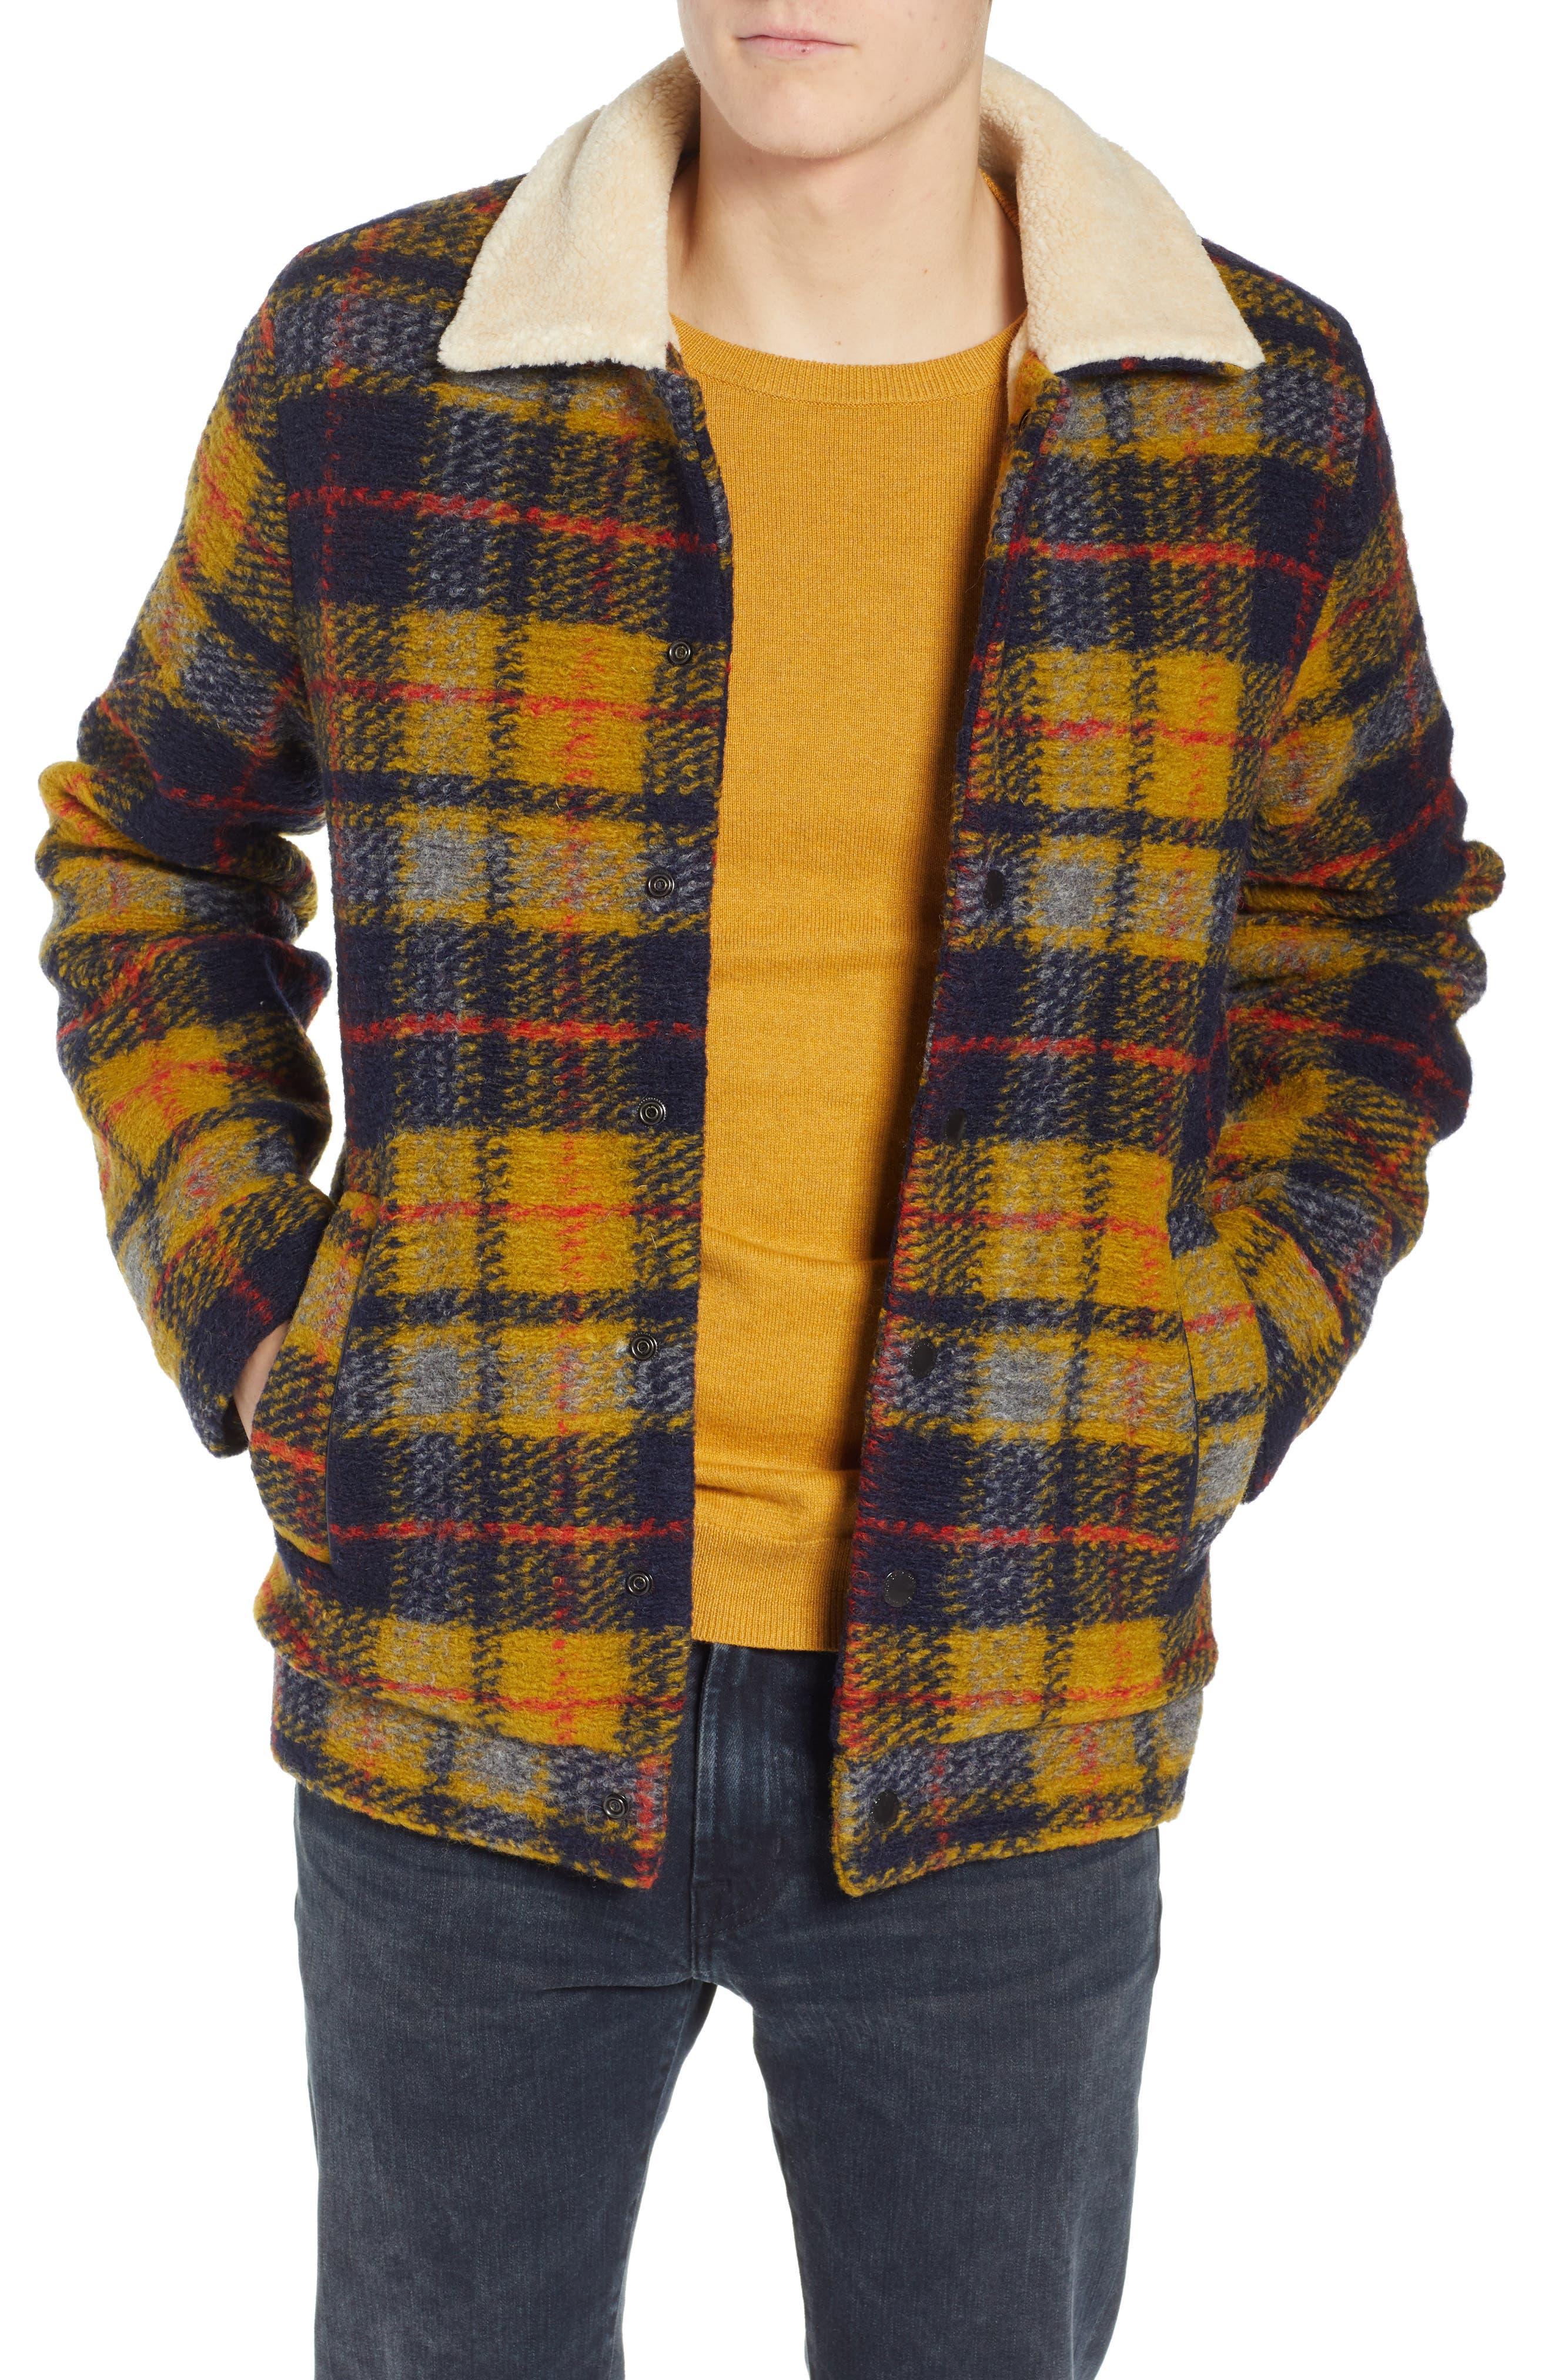 1930s Men's Clothing Mens Scotch  Soda Plaid Faux Shearling Lined Wool Blend Trucker Jacket $325.00 AT vintagedancer.com